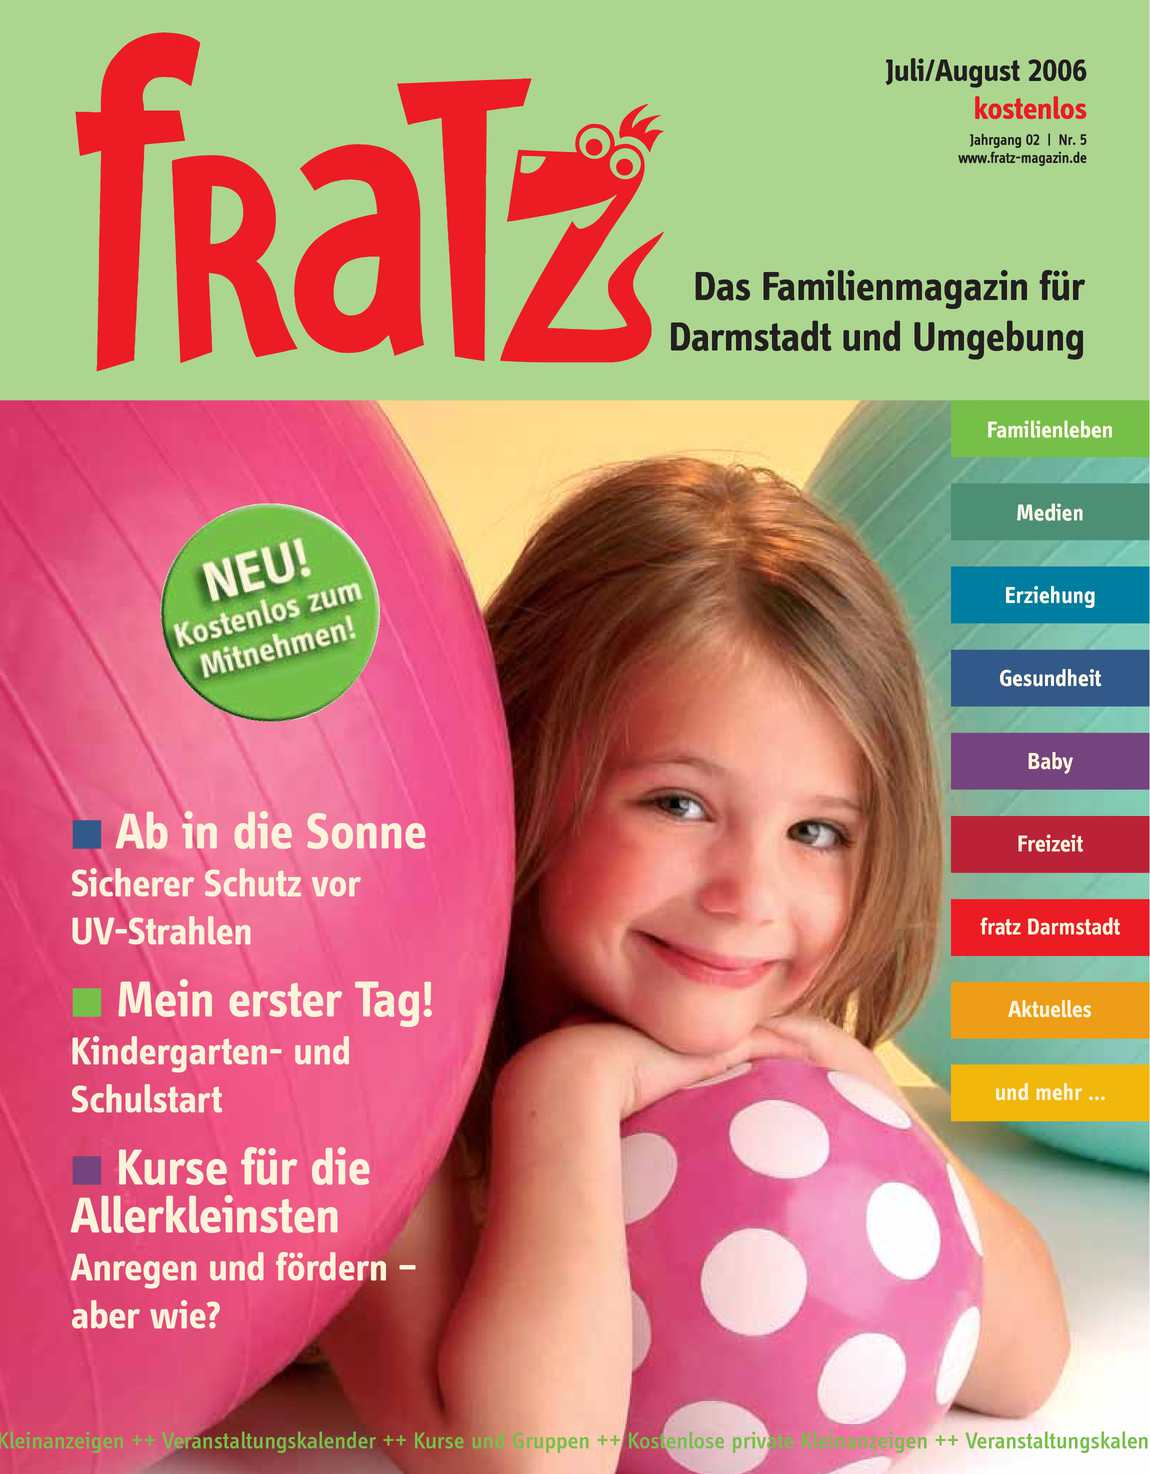 Baby GroßZüGig Maxi Cosi 0-13kg Verbraucher Zuerst